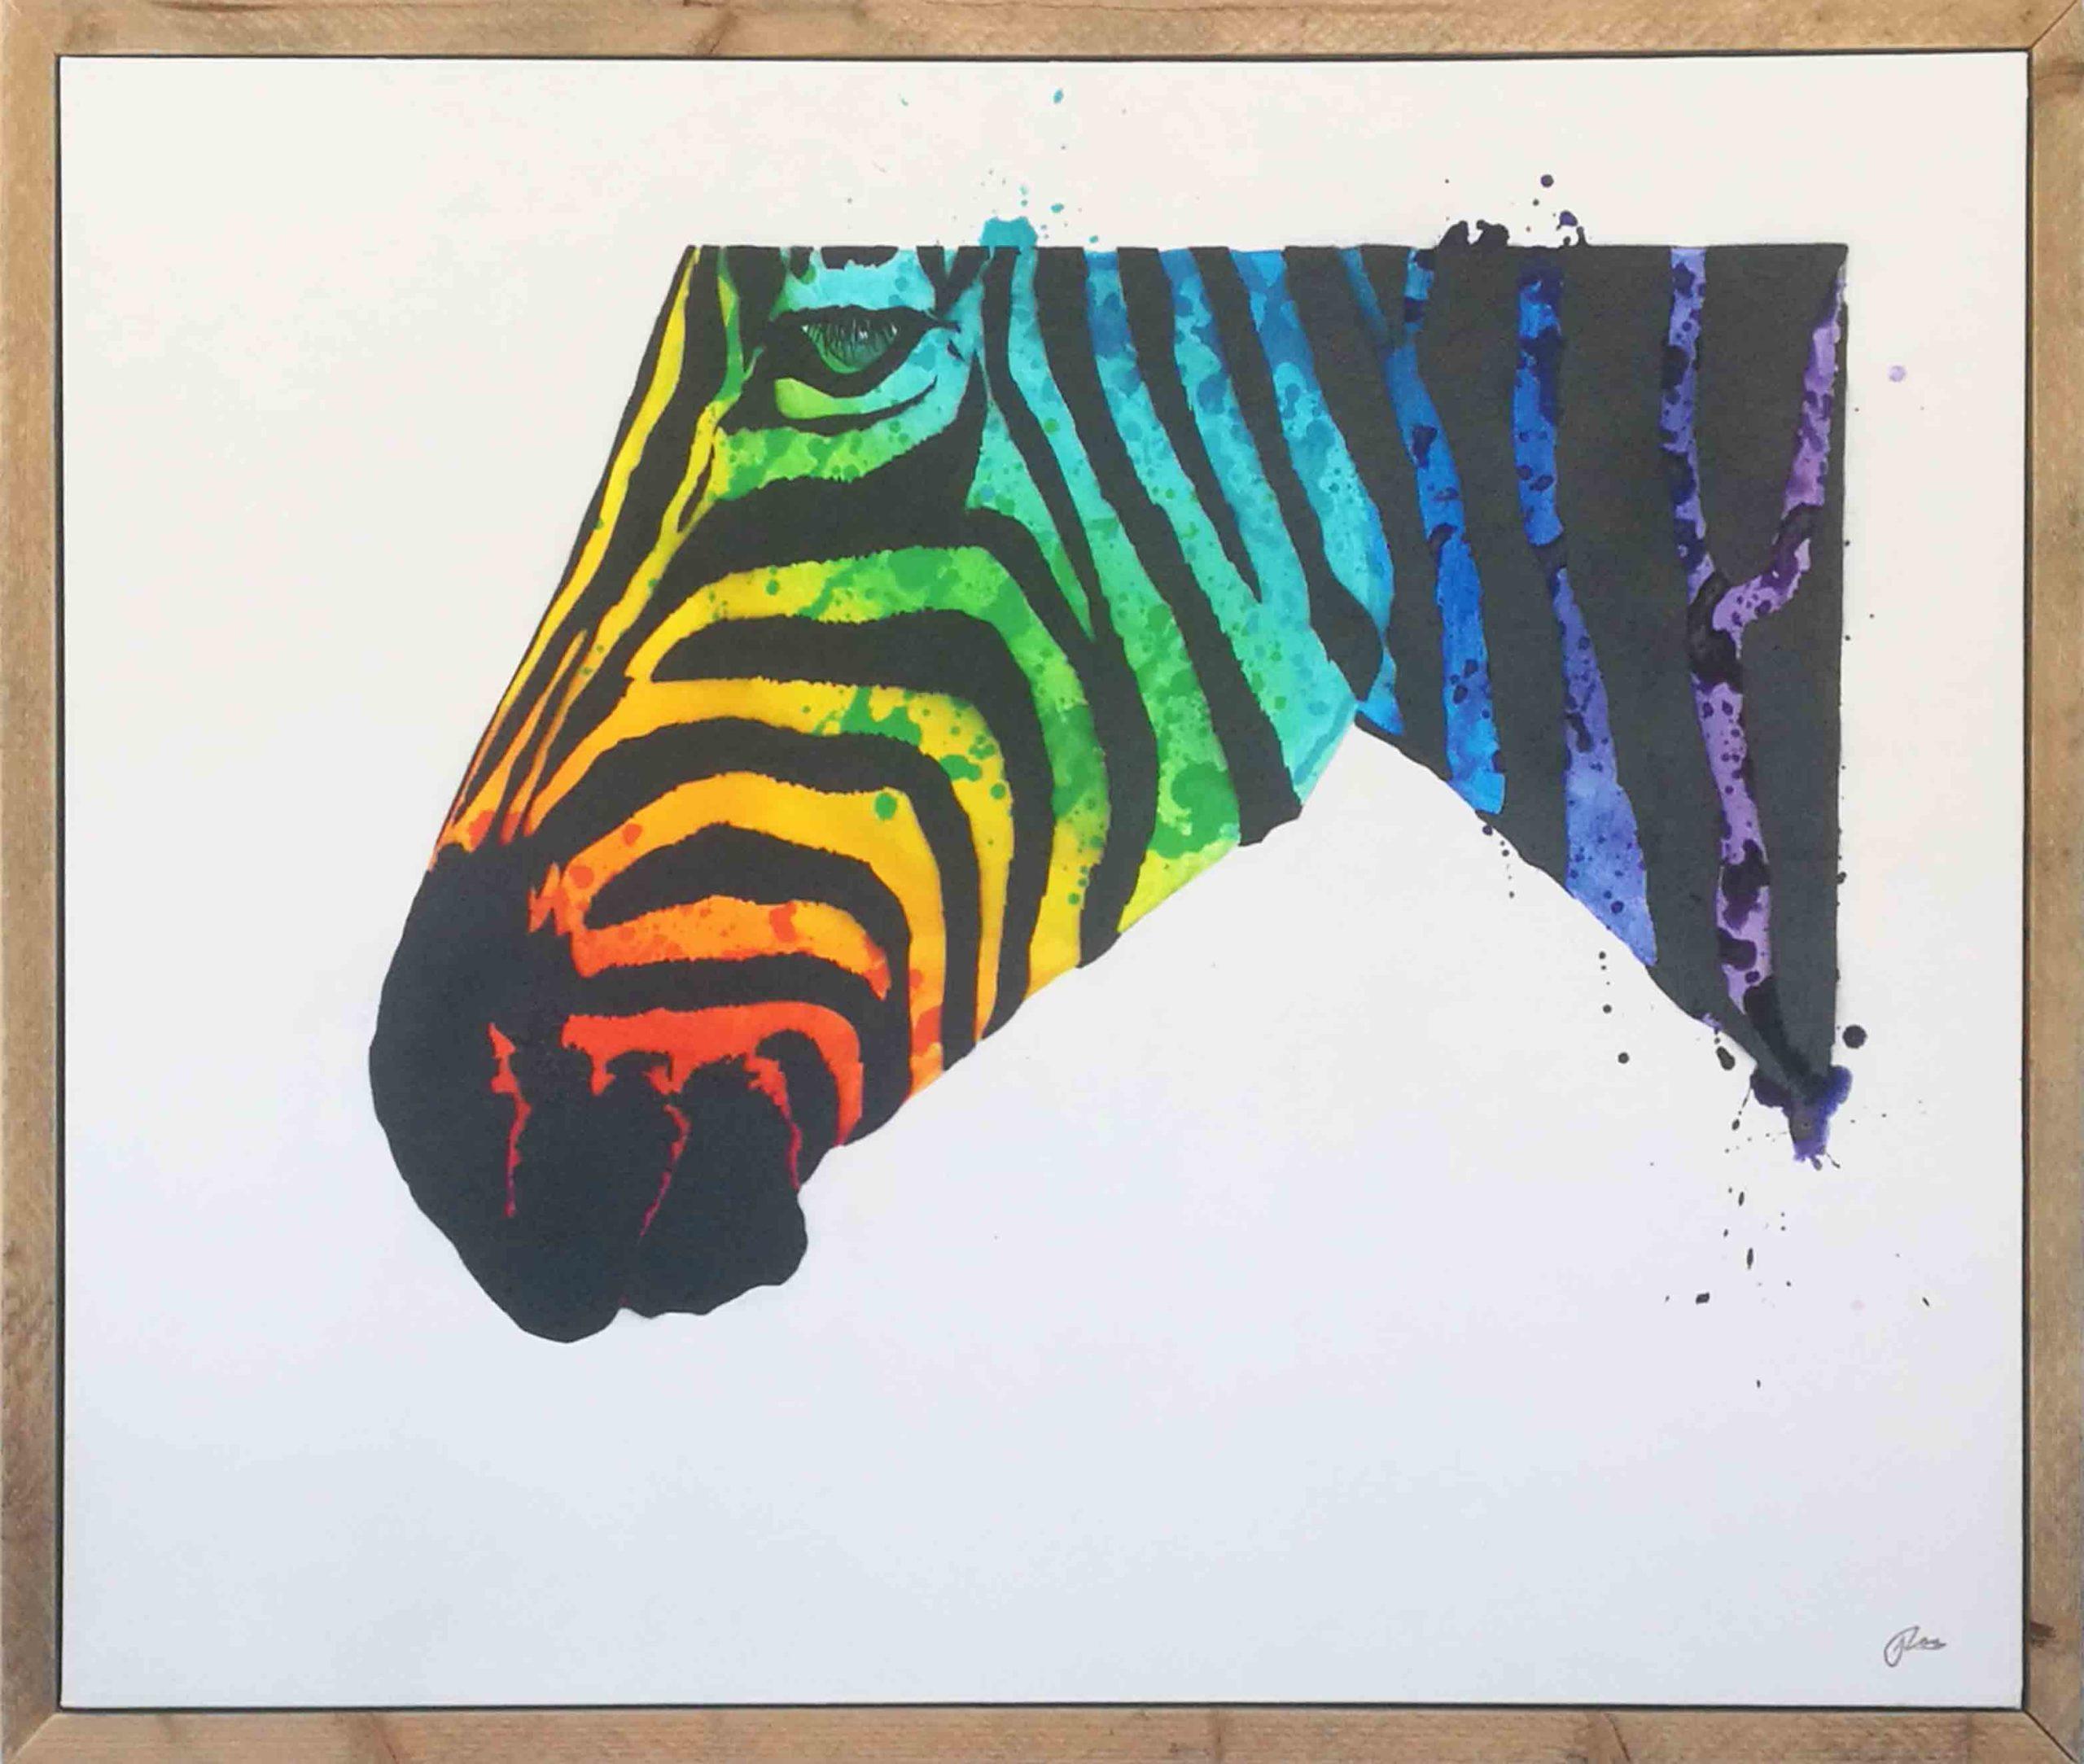 Stripes: Alt blir zebra! 100 x 80 (Original 2/2) | 6900,-